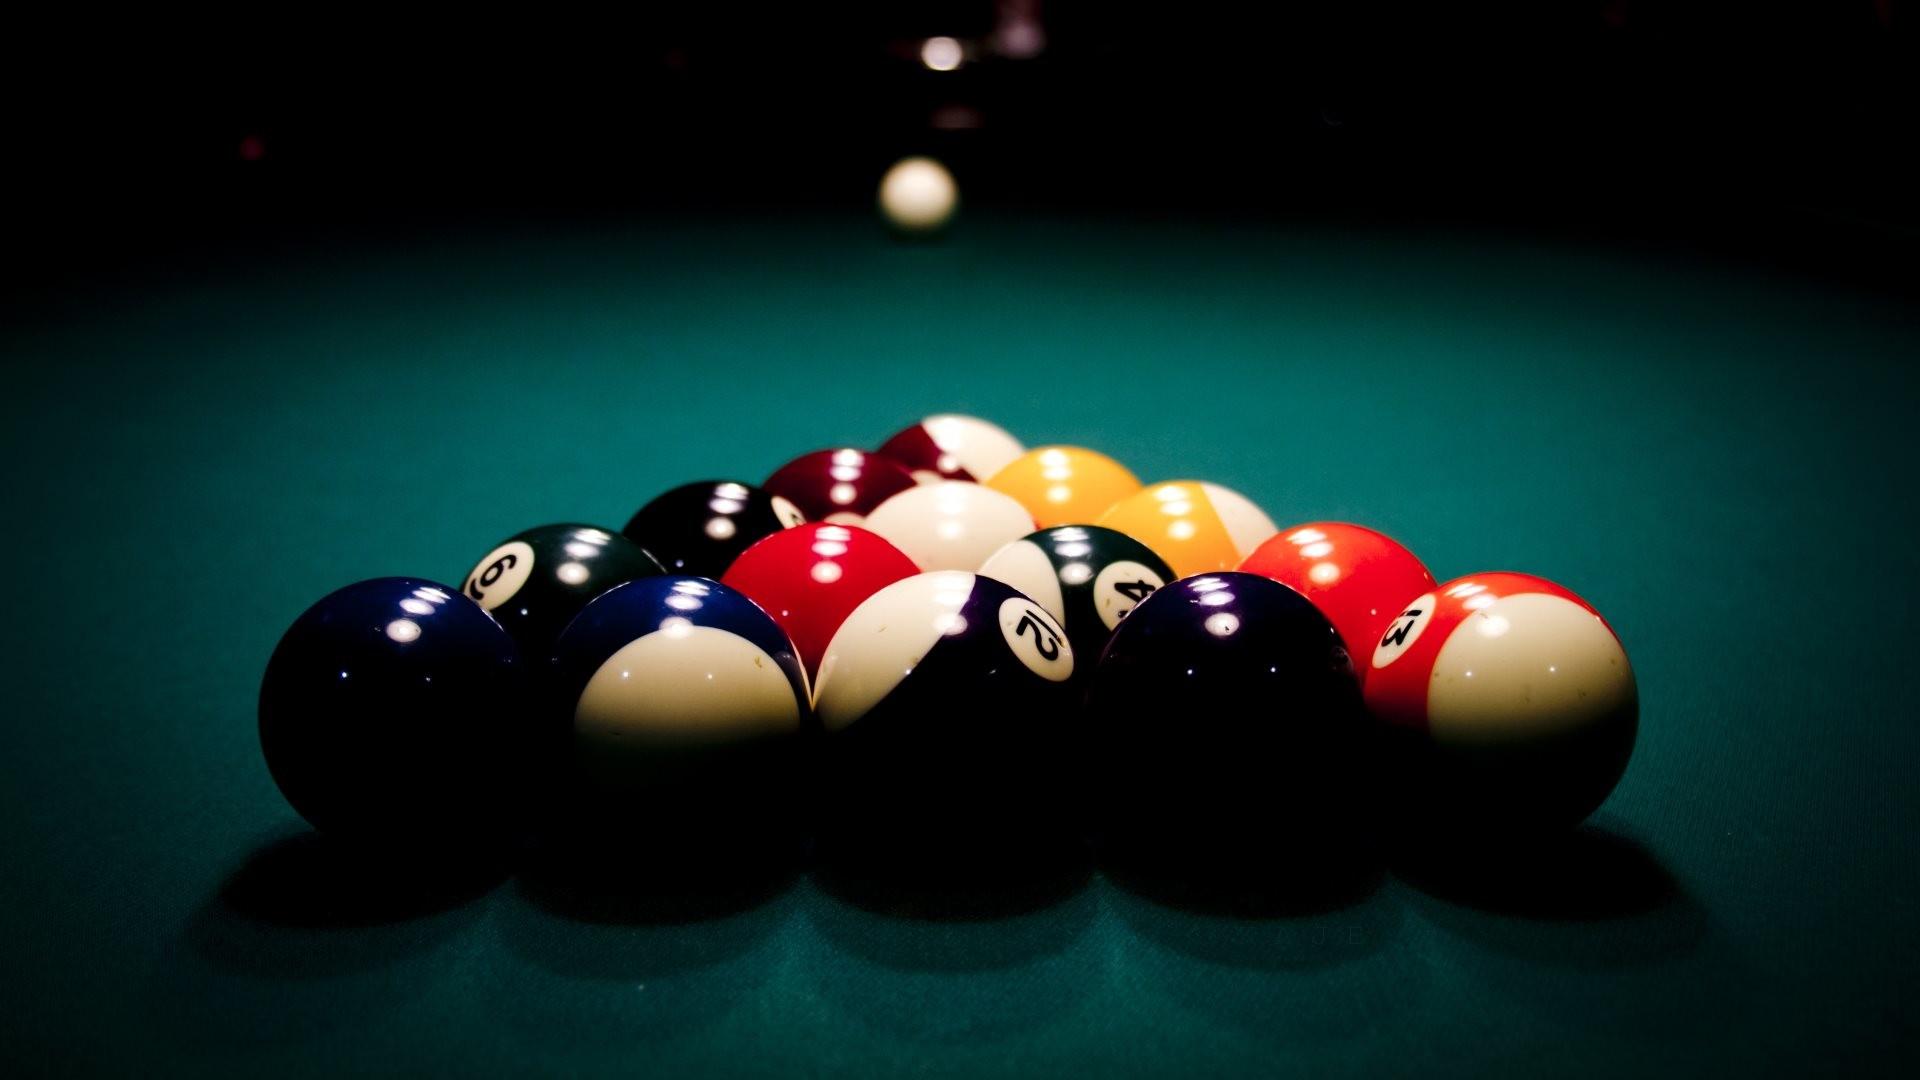 8 Ball Pool Wallpaper (77+ images)